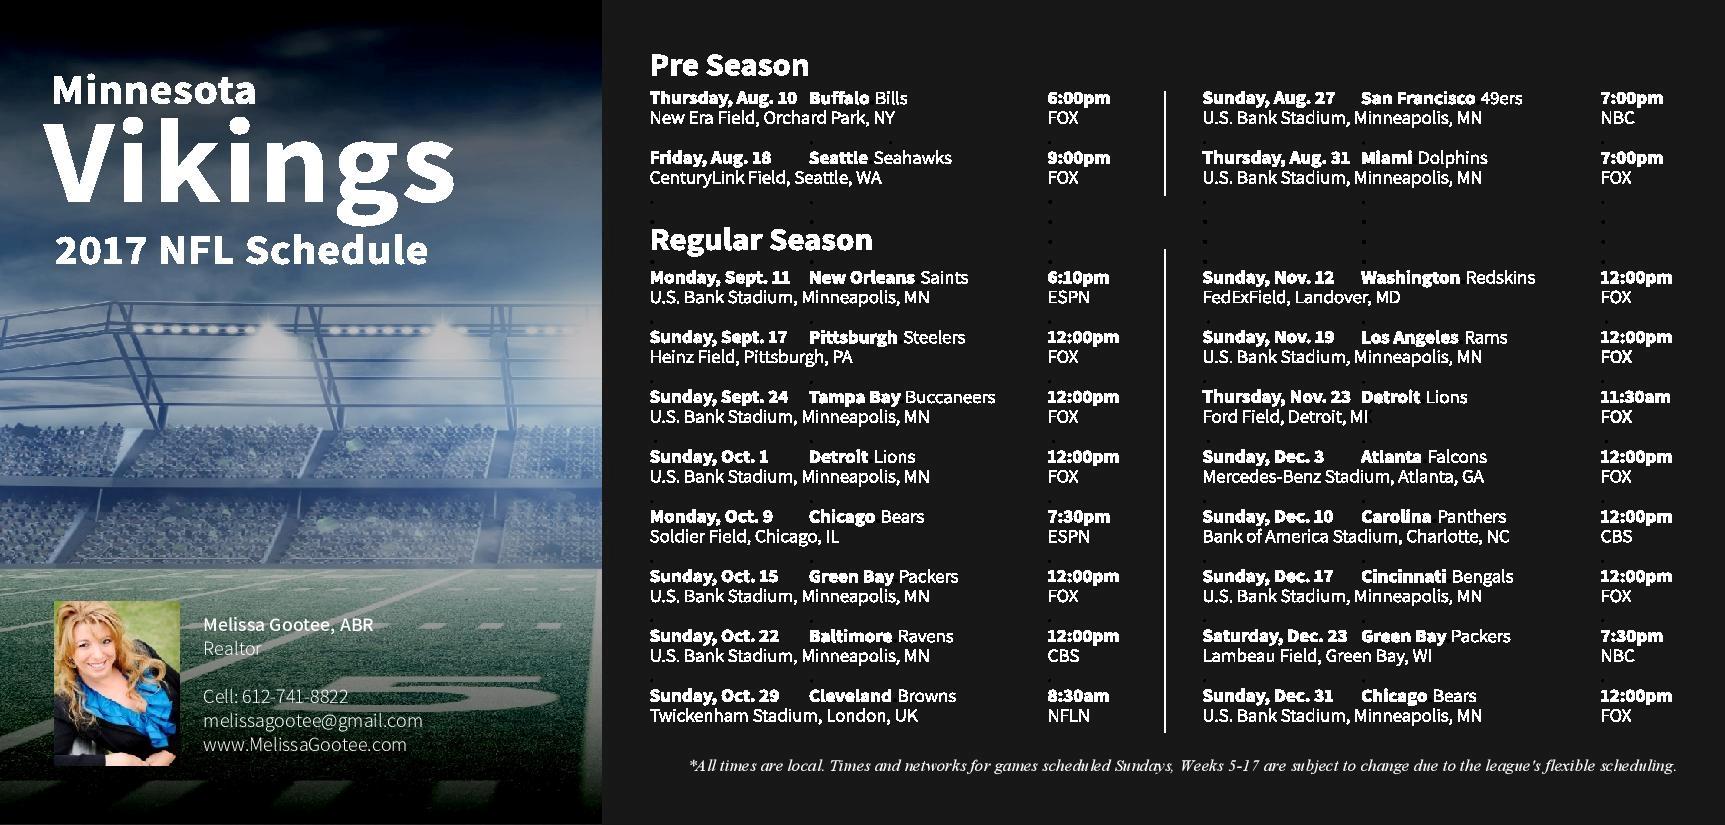 Your Minnesota Vikings 2017 Schedule